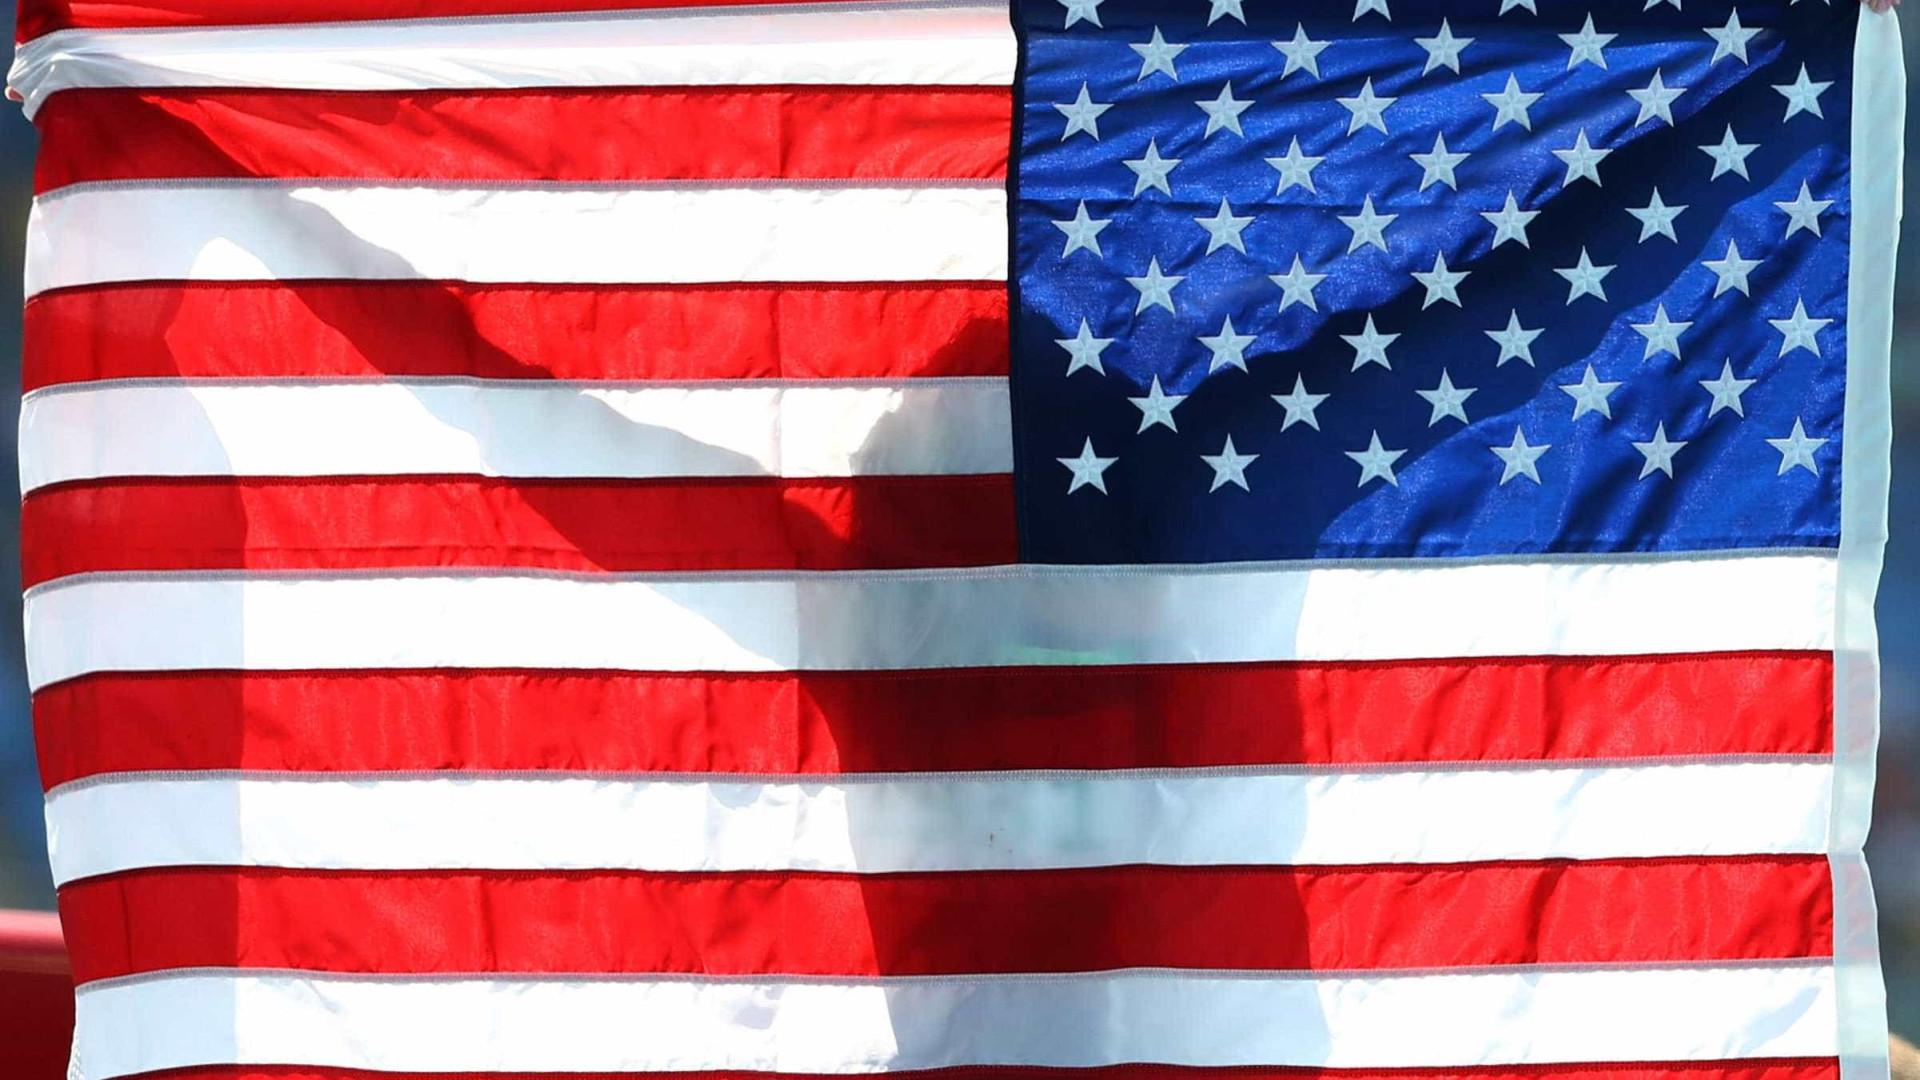 Embaixada dos EUA no Zimbabué anuncia que vai estar fechada hoje